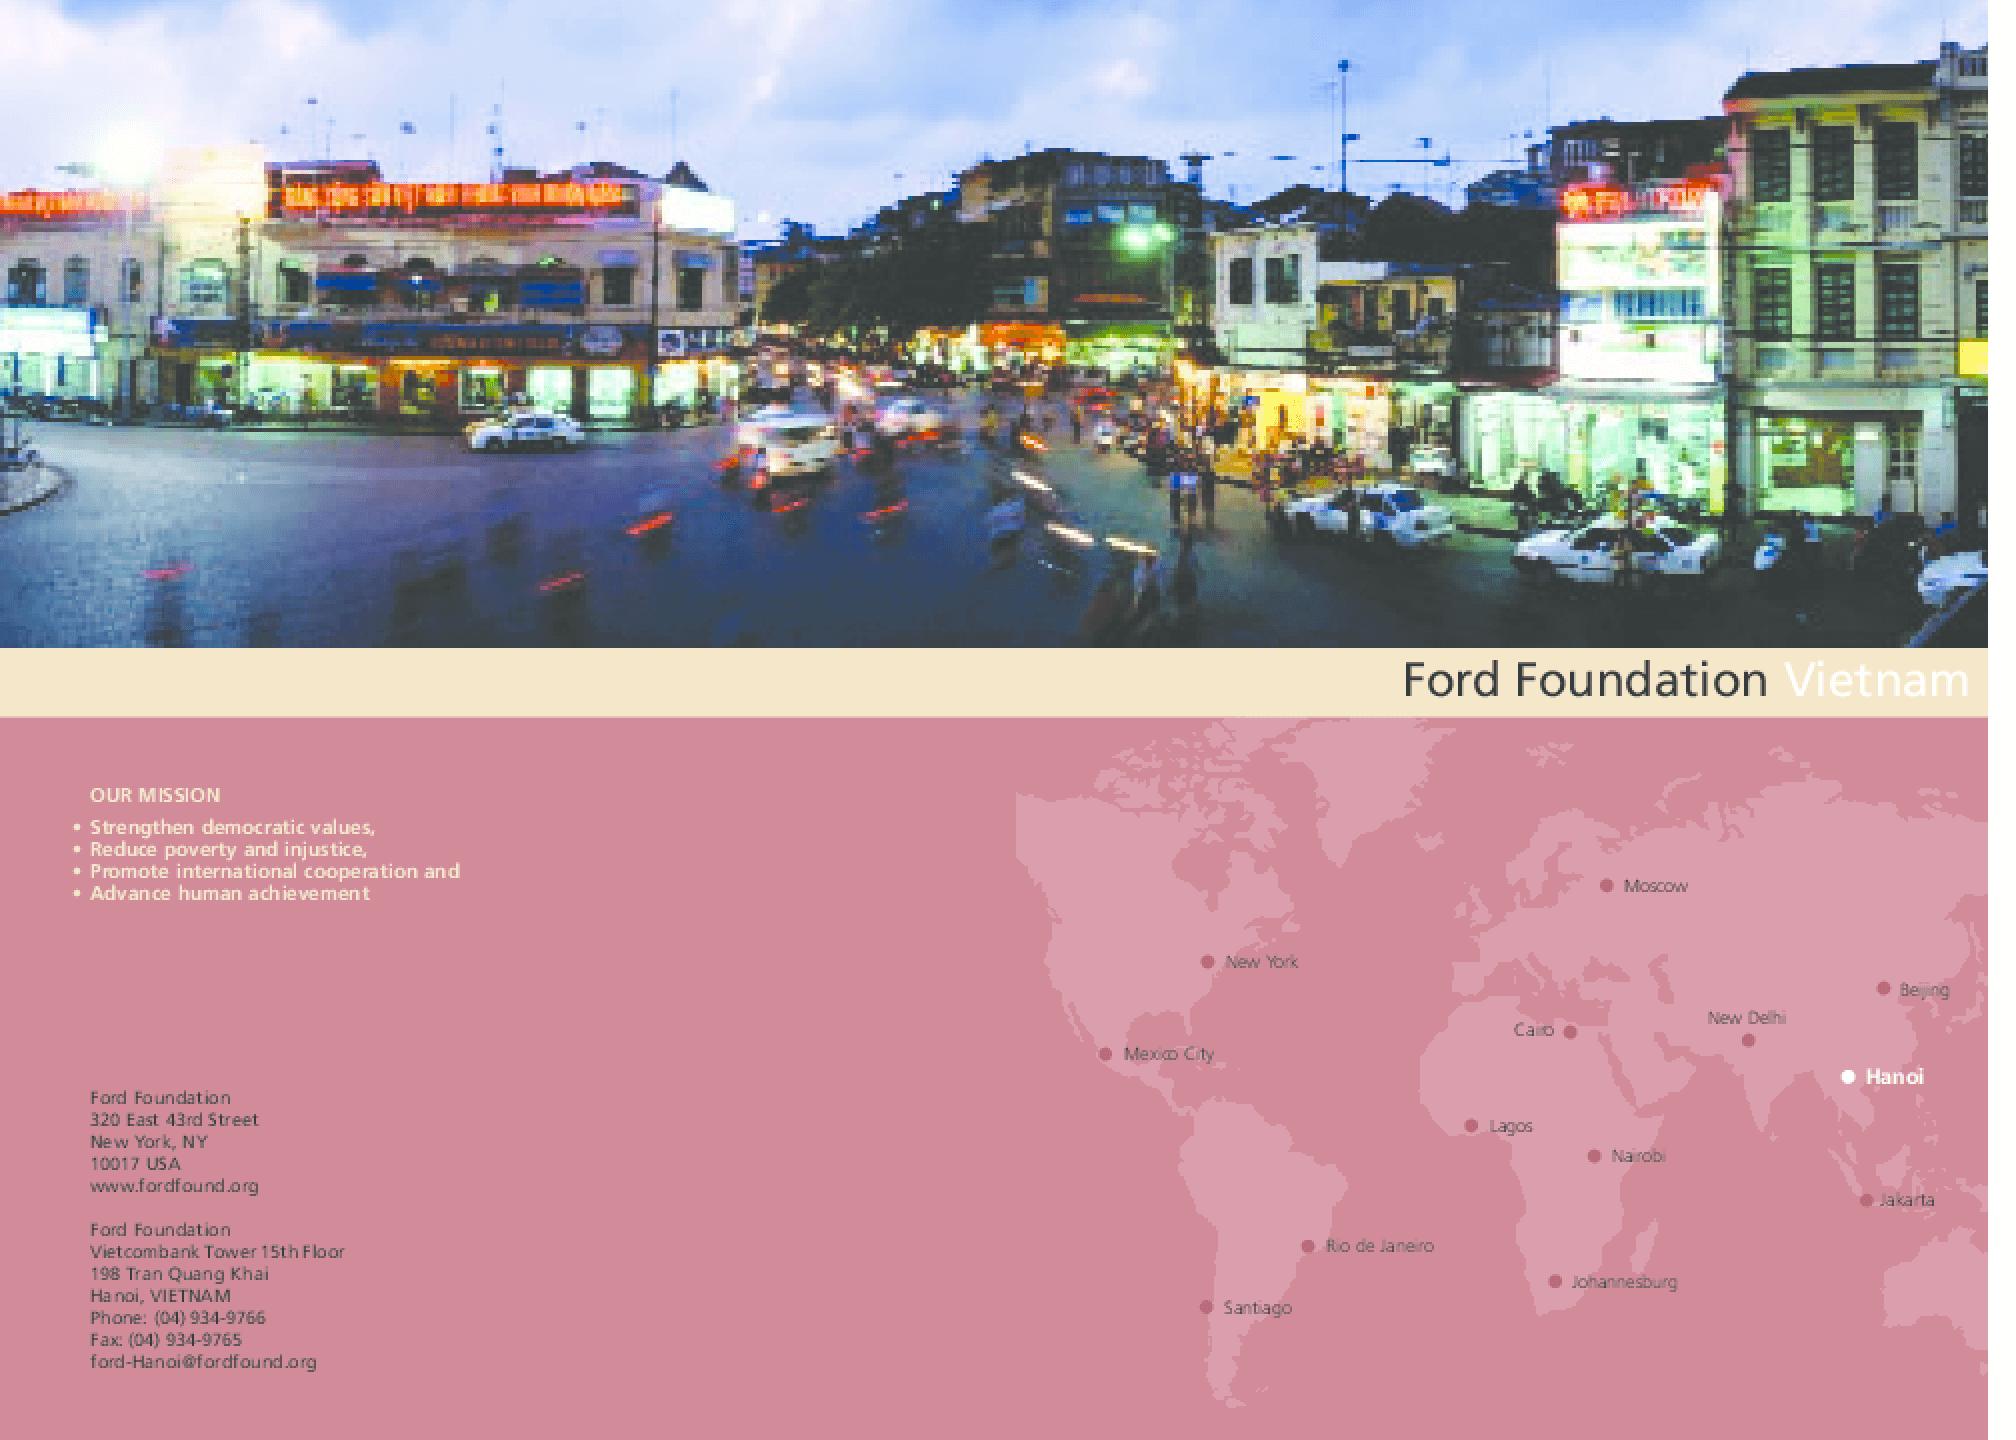 Ford Foundation Vietnam